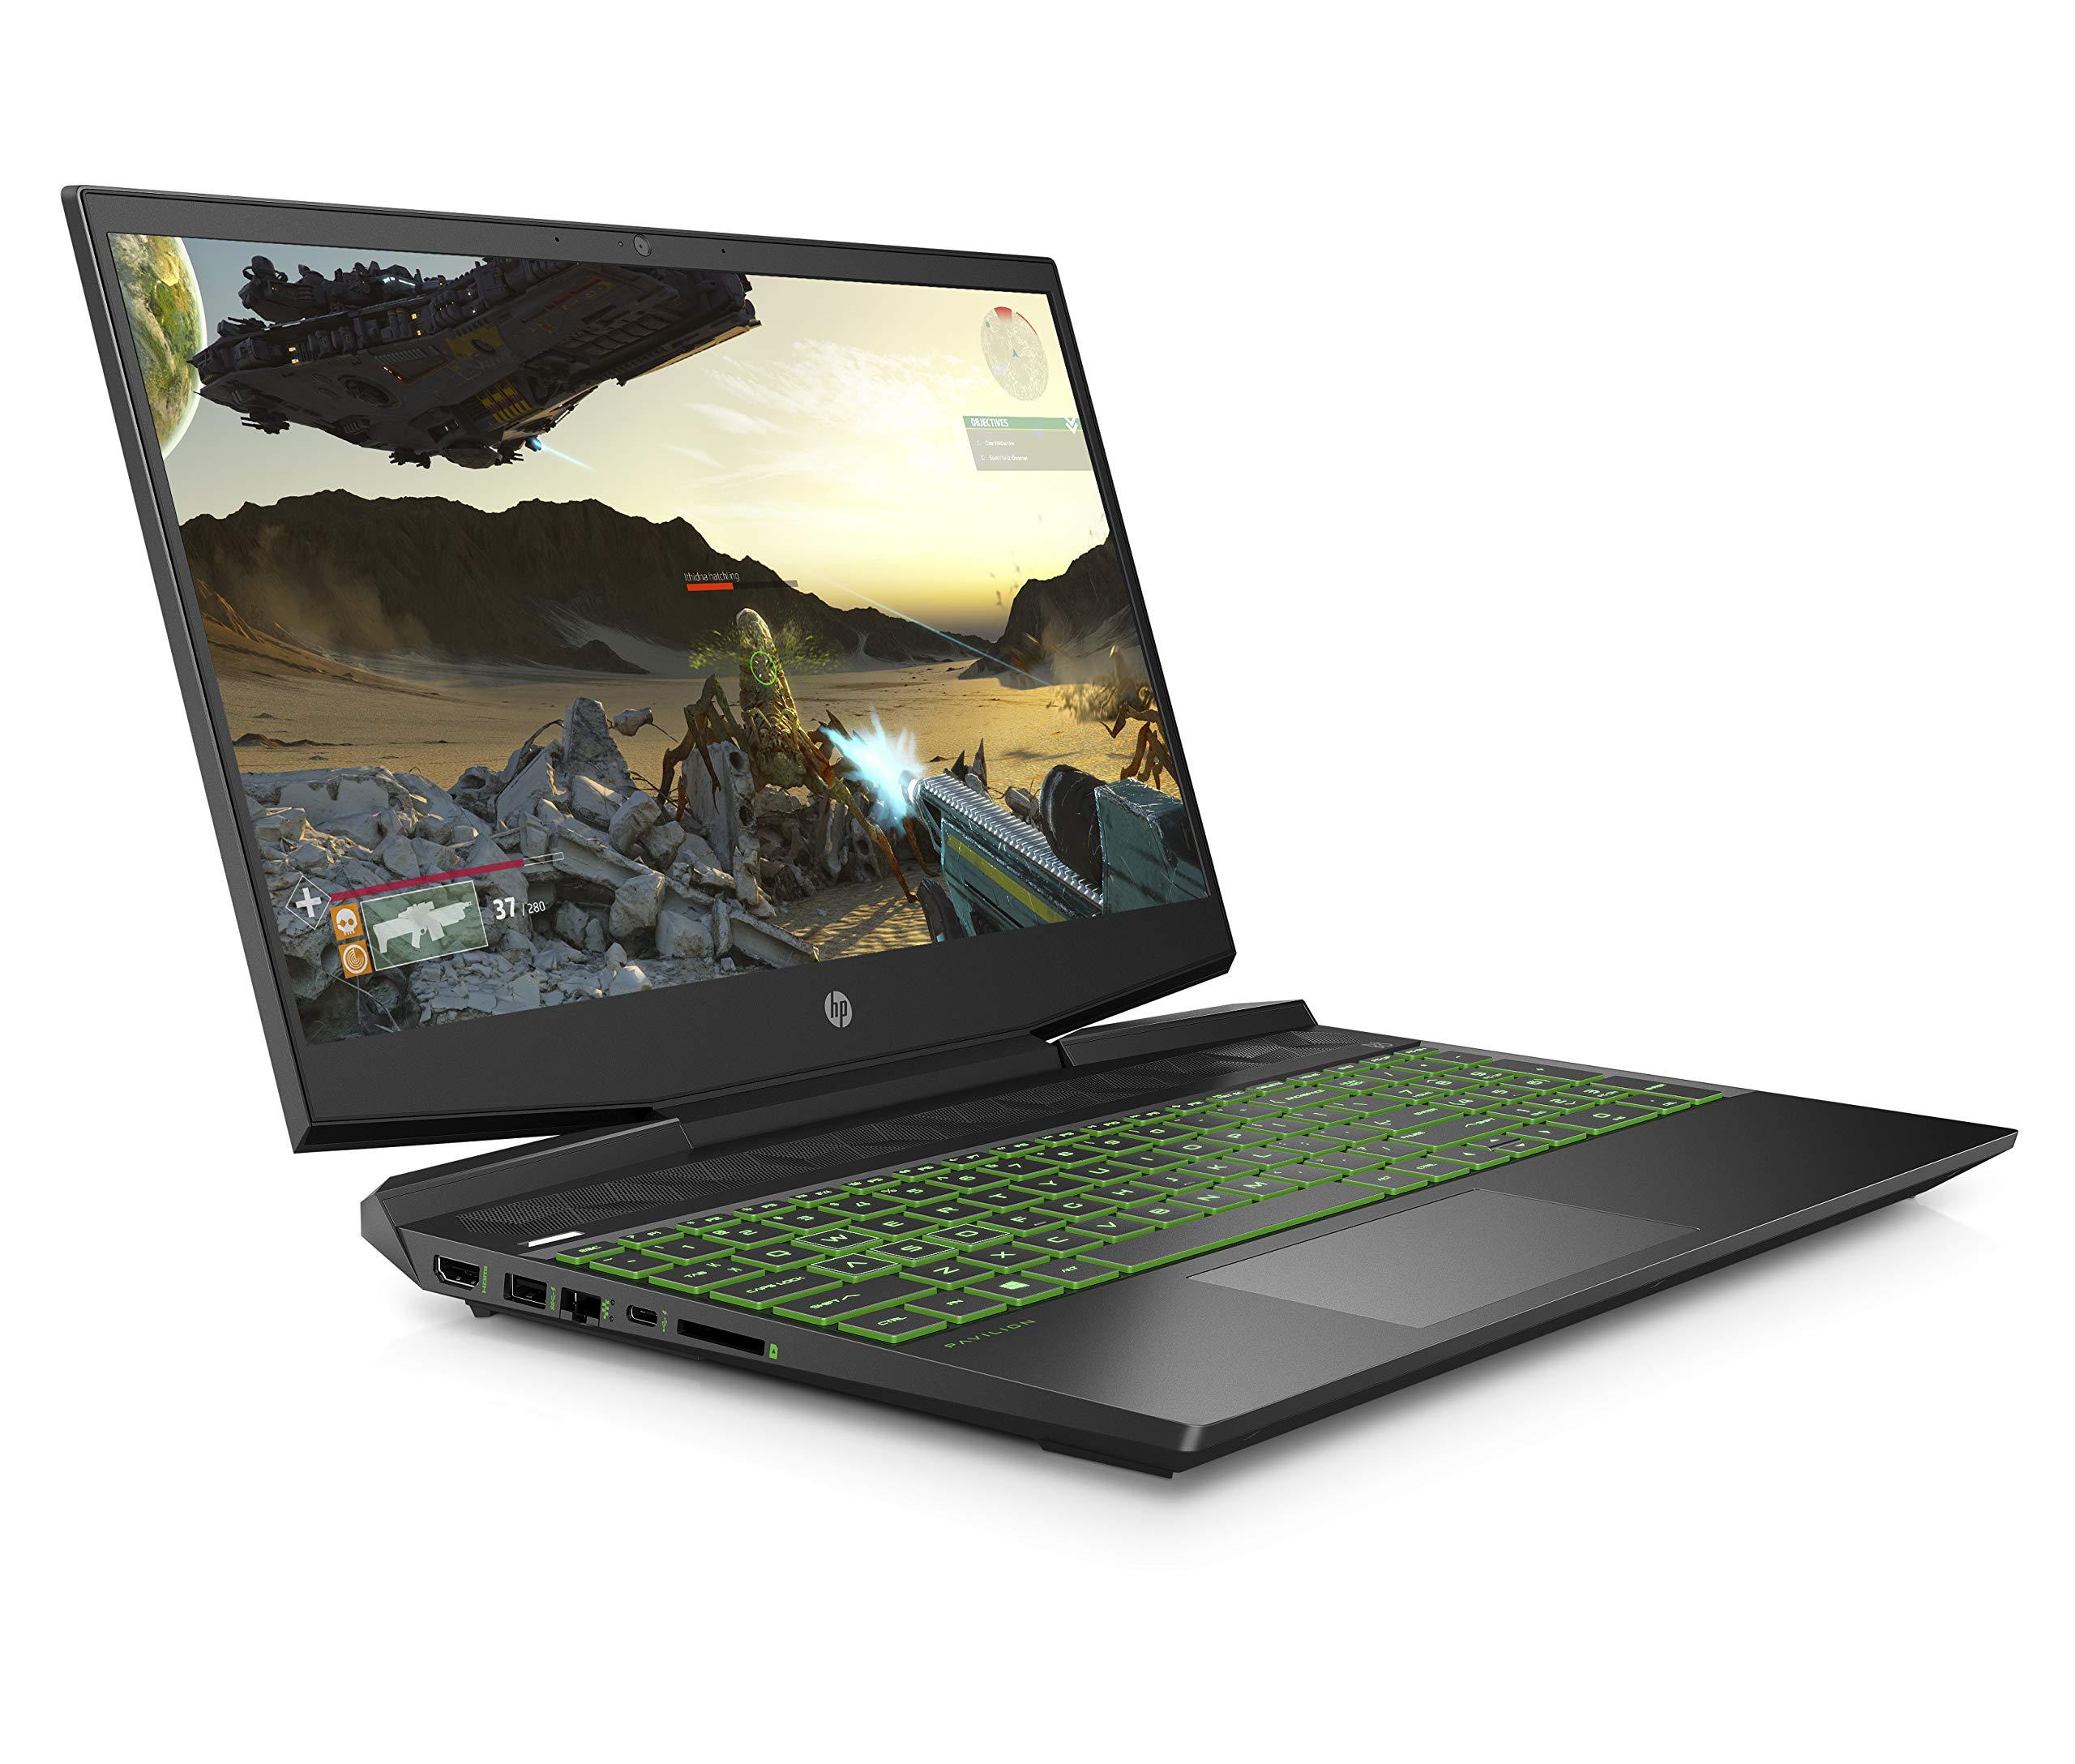 HP Pavilion 15-bc508na 15.6 Inch FHD Gaming Laptop, Intel Core i5-9300H, 8 GB RAM, 512 GB SSD, NVIDIA GeForce GTX 1050…